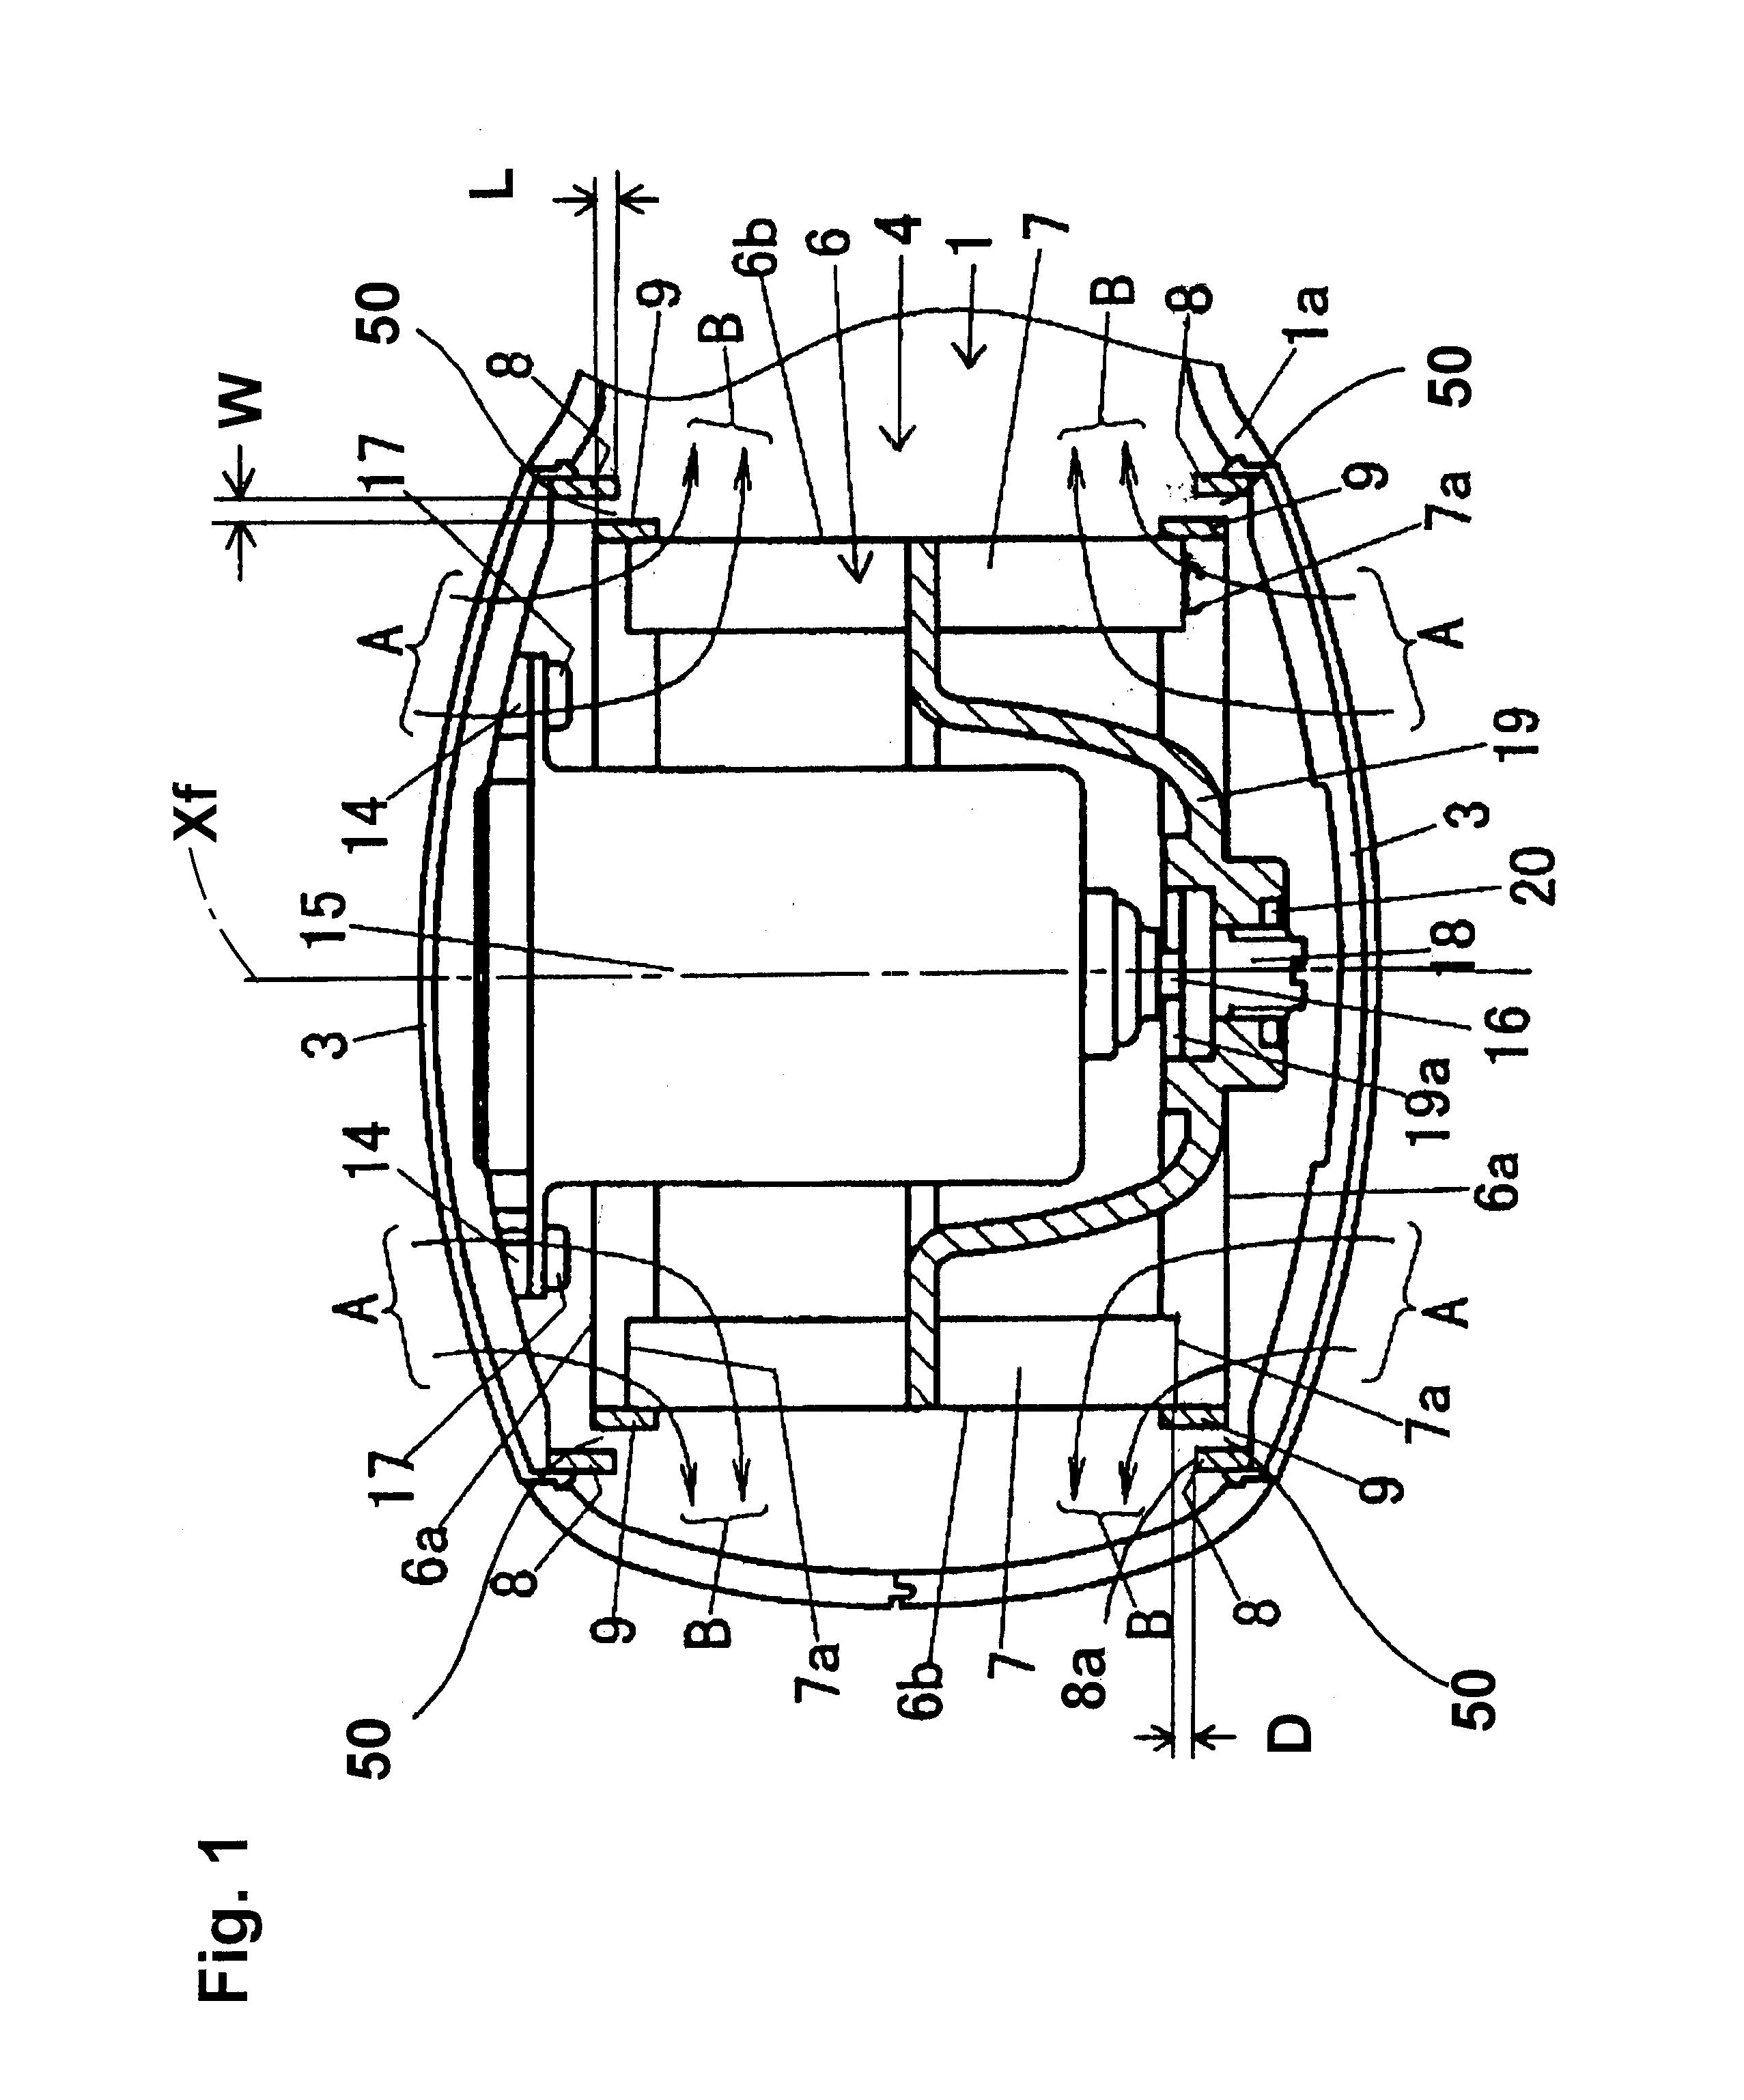 kenwood ddx7017 wiring diagram